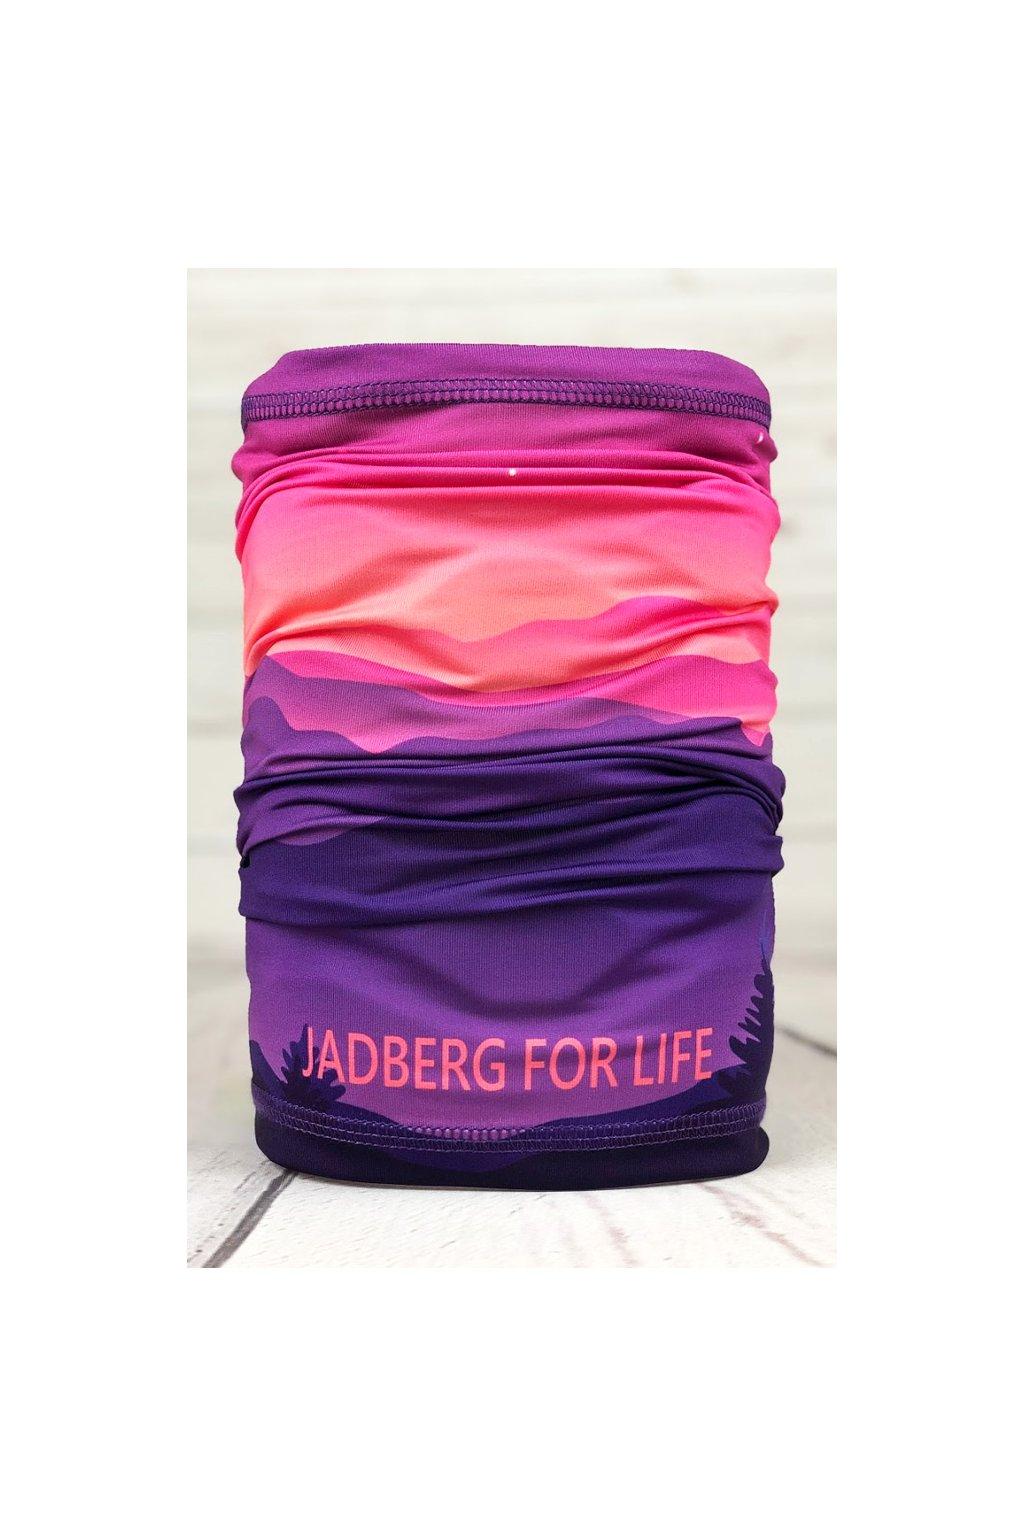 jadberg nakrcnik sunset neck warmer 1